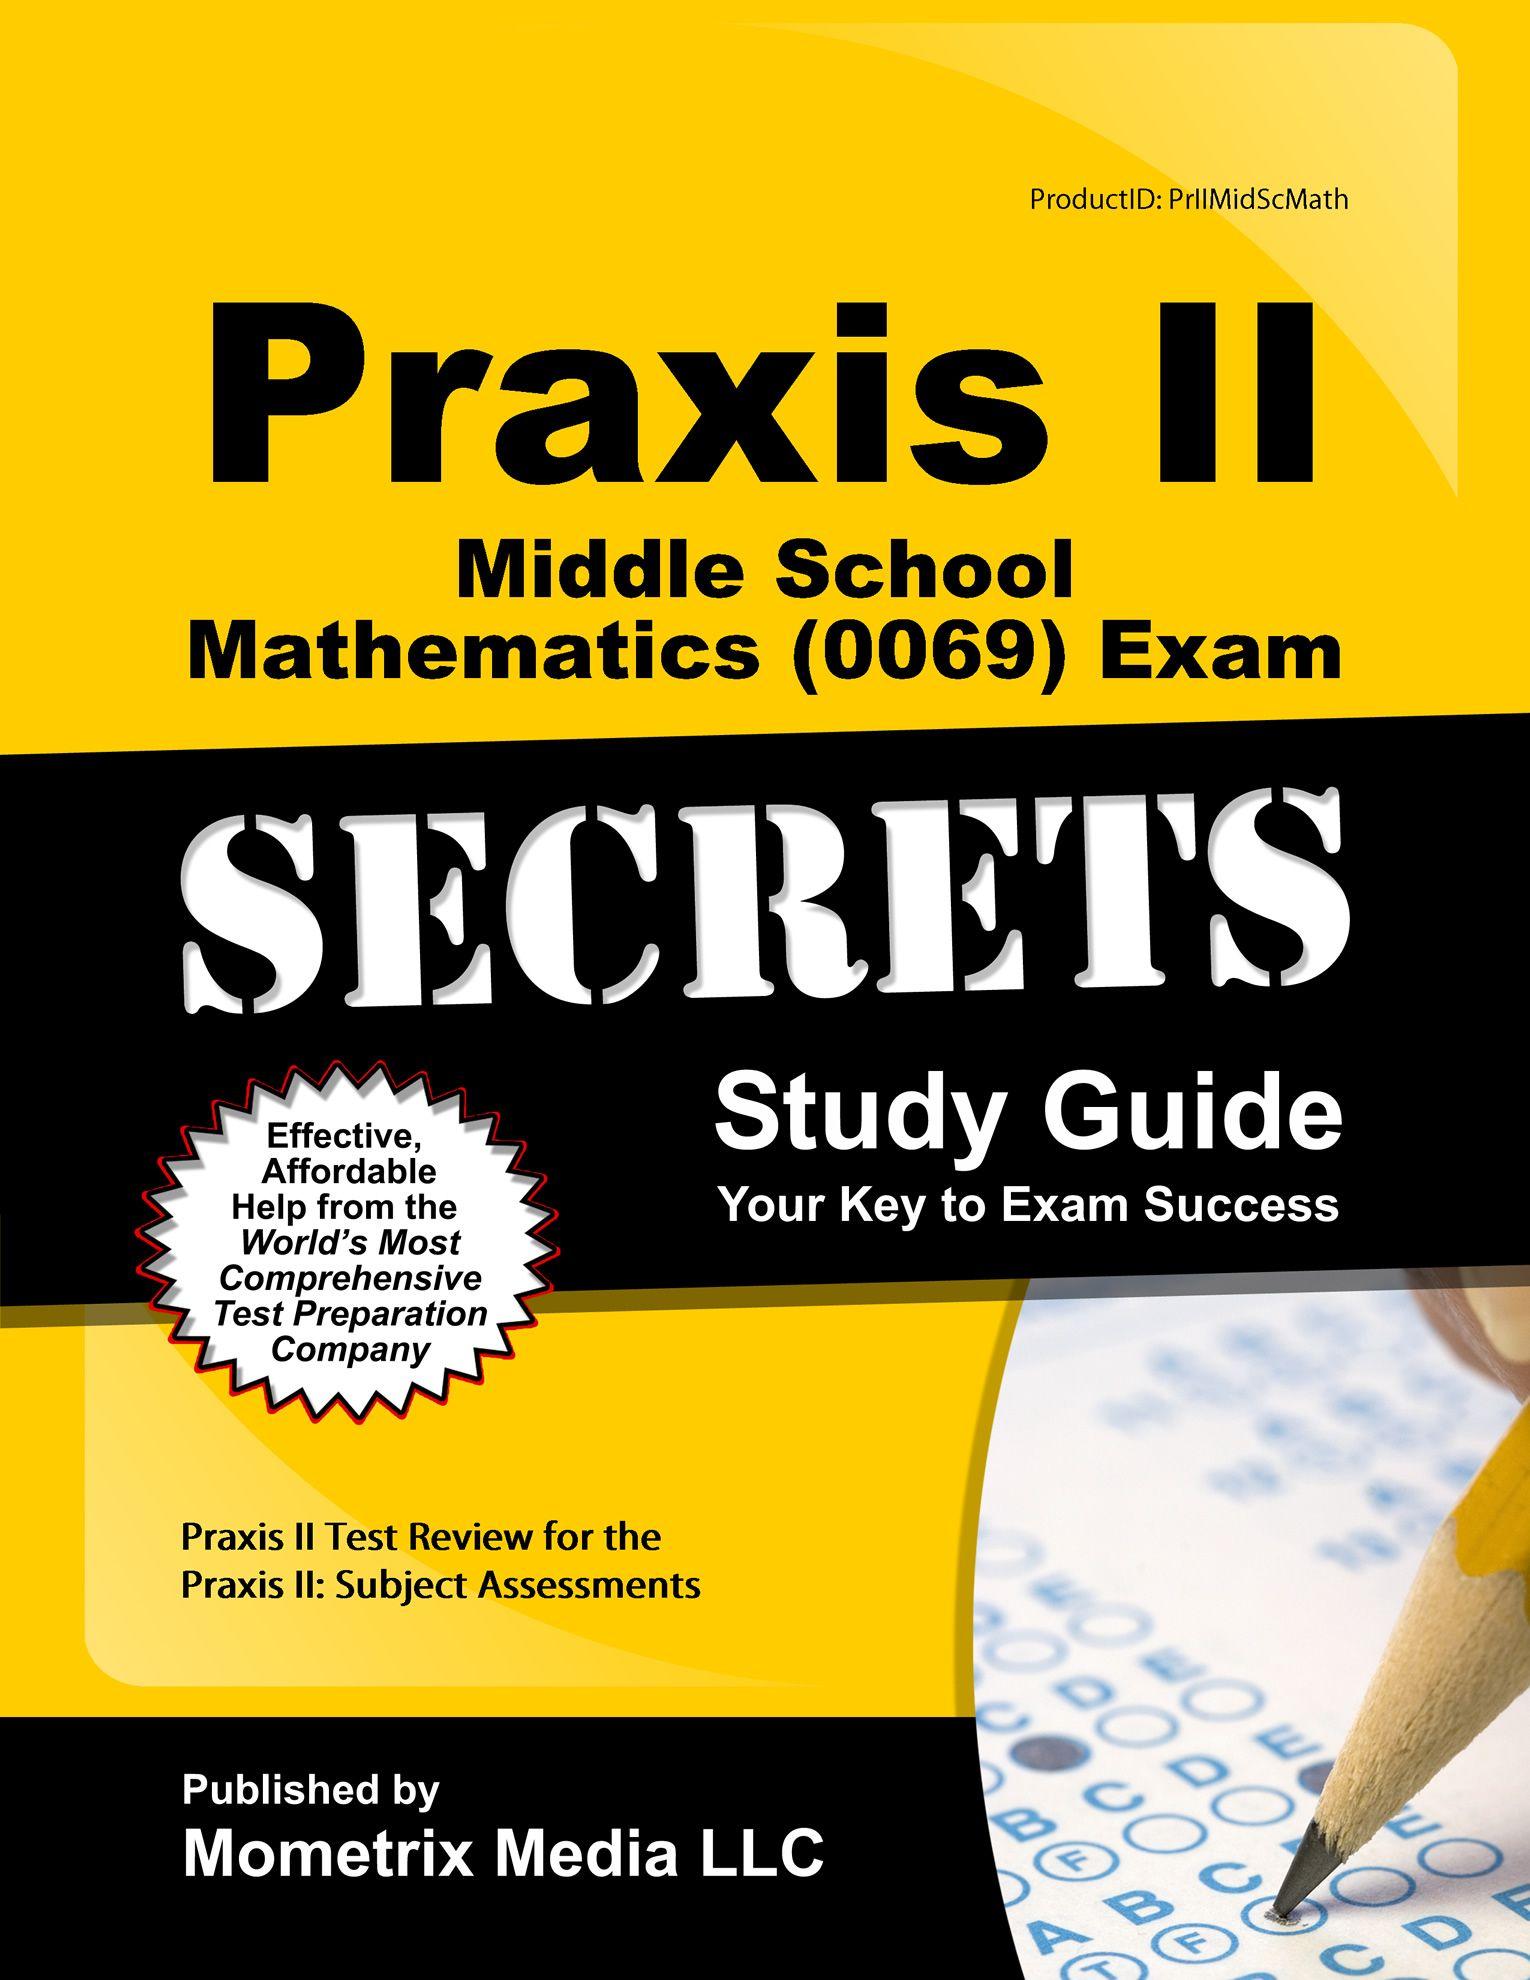 Praxis II Middle School Mathematics (0069) Exam Study